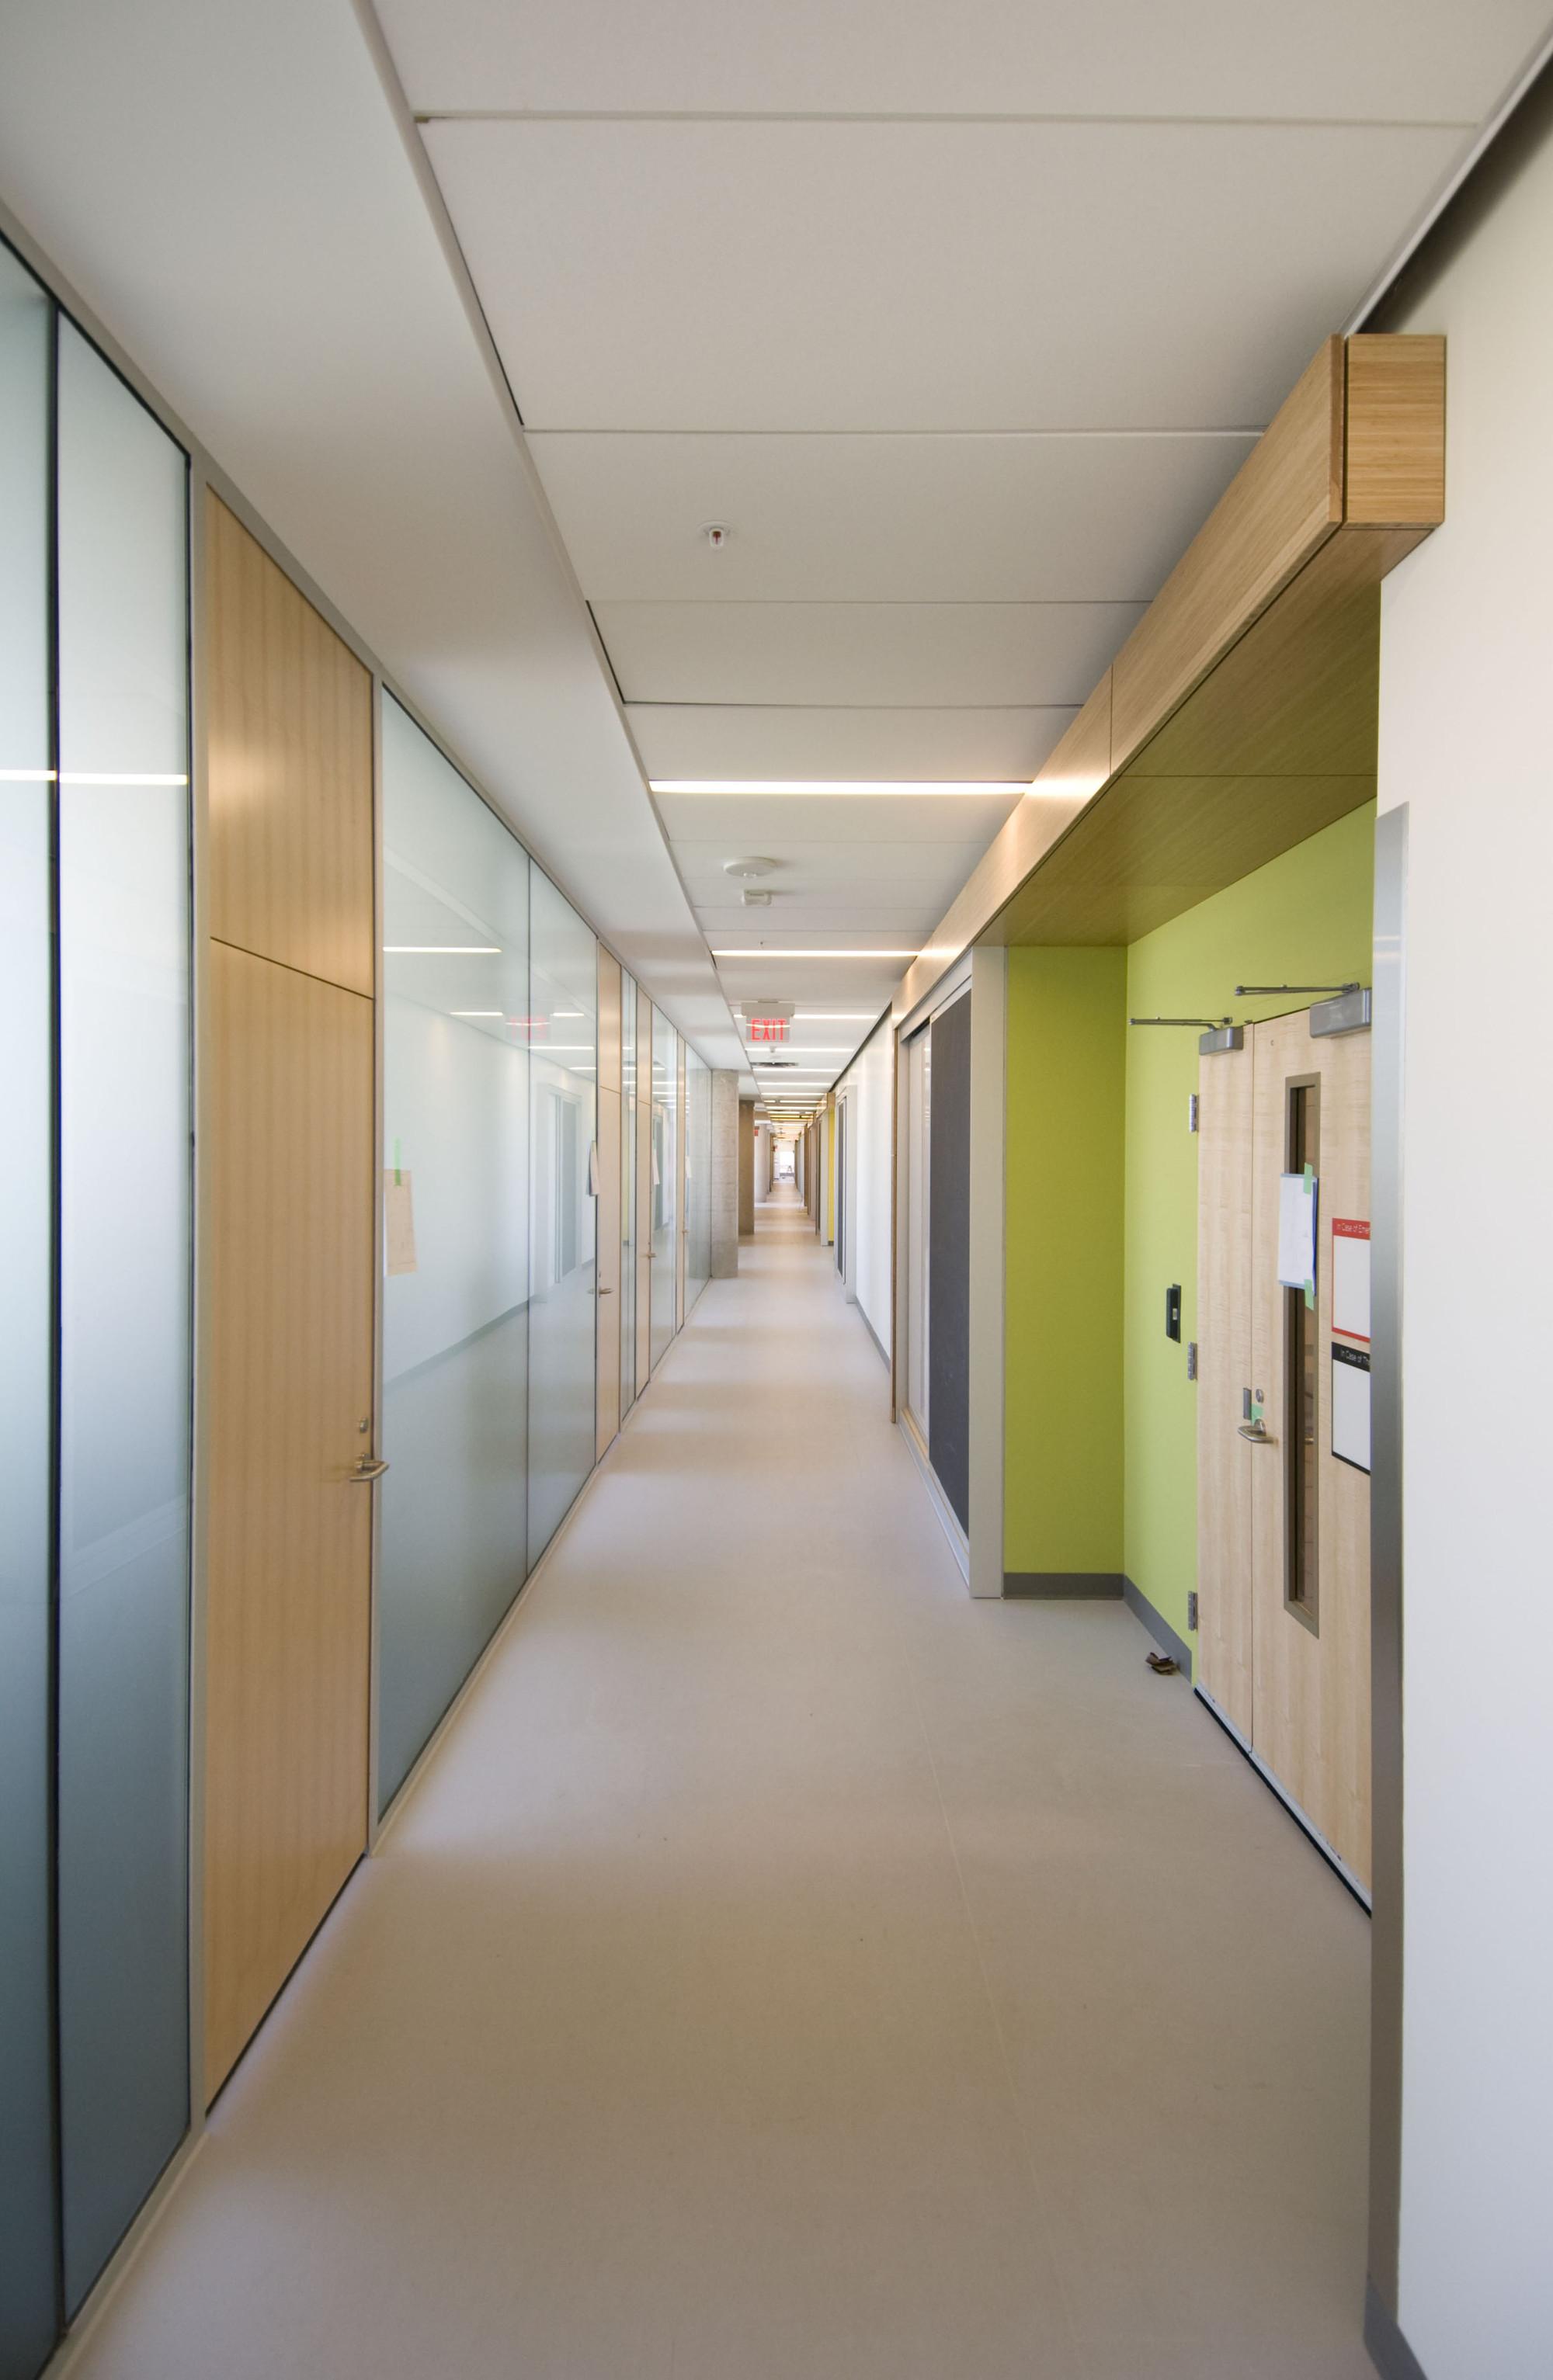 Brock University / Payette - ArchitectsAlliance